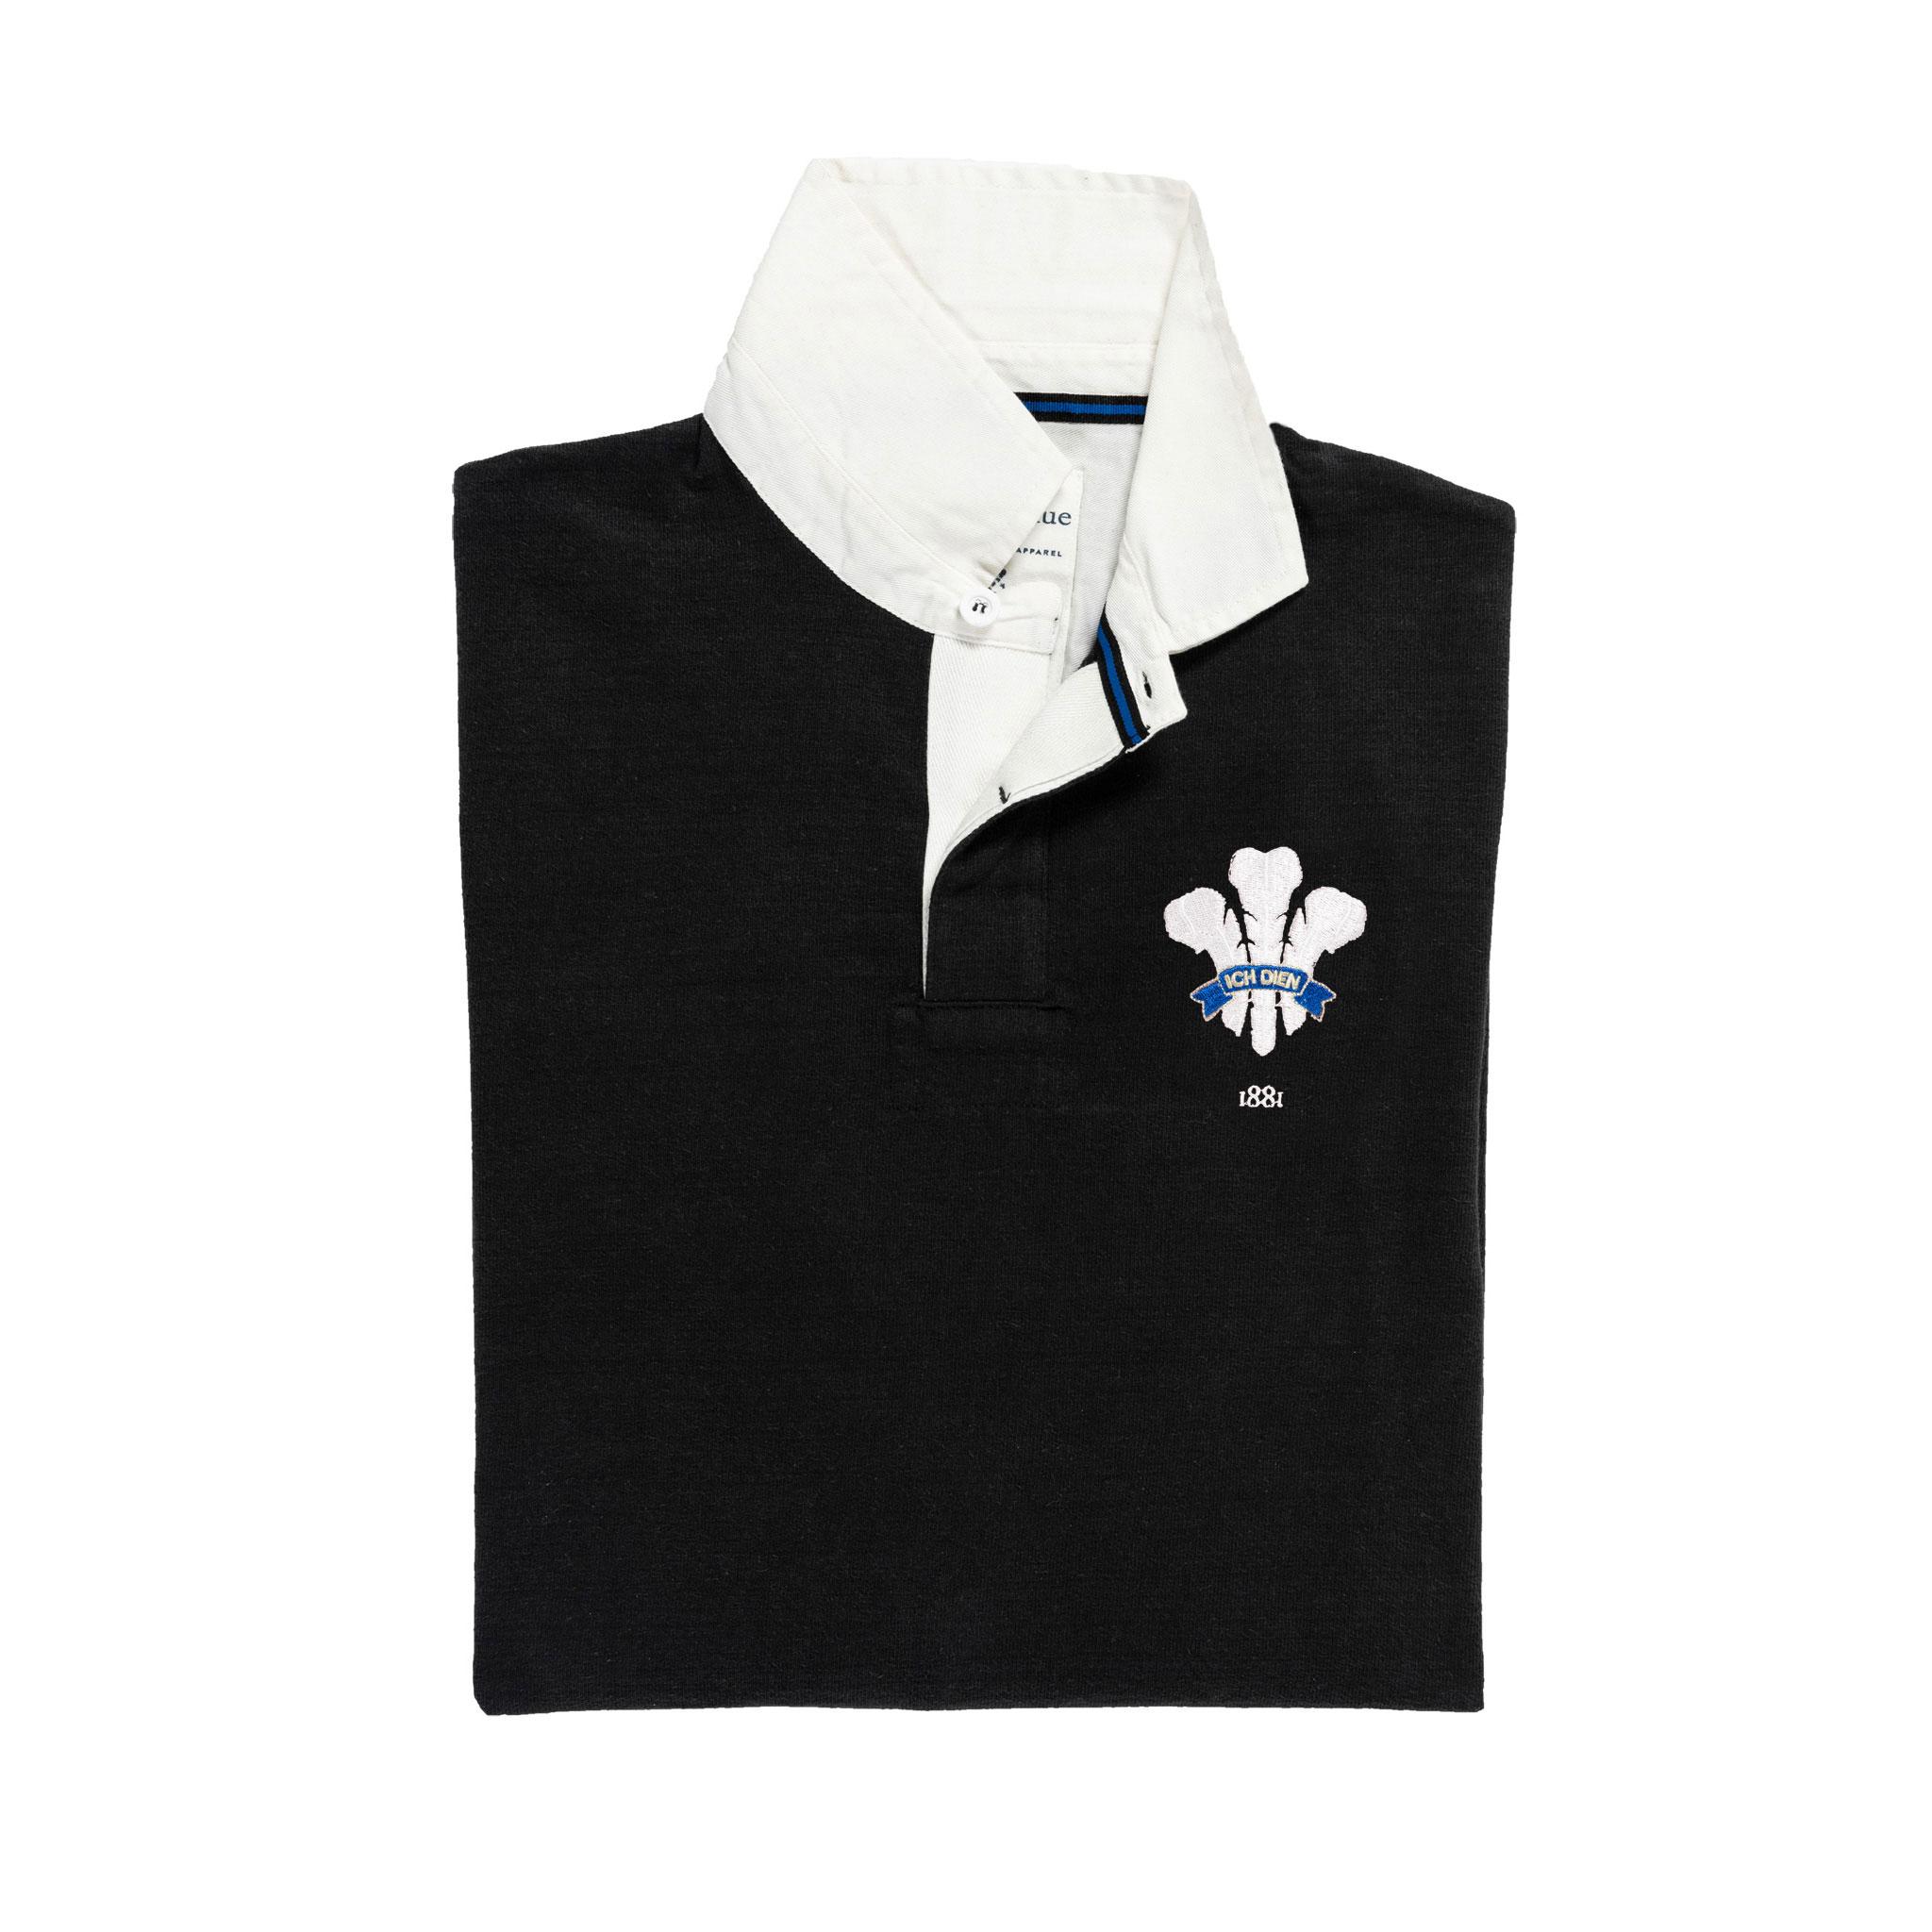 Wales 1881 Black Vintage Rugby Shirt_Folded